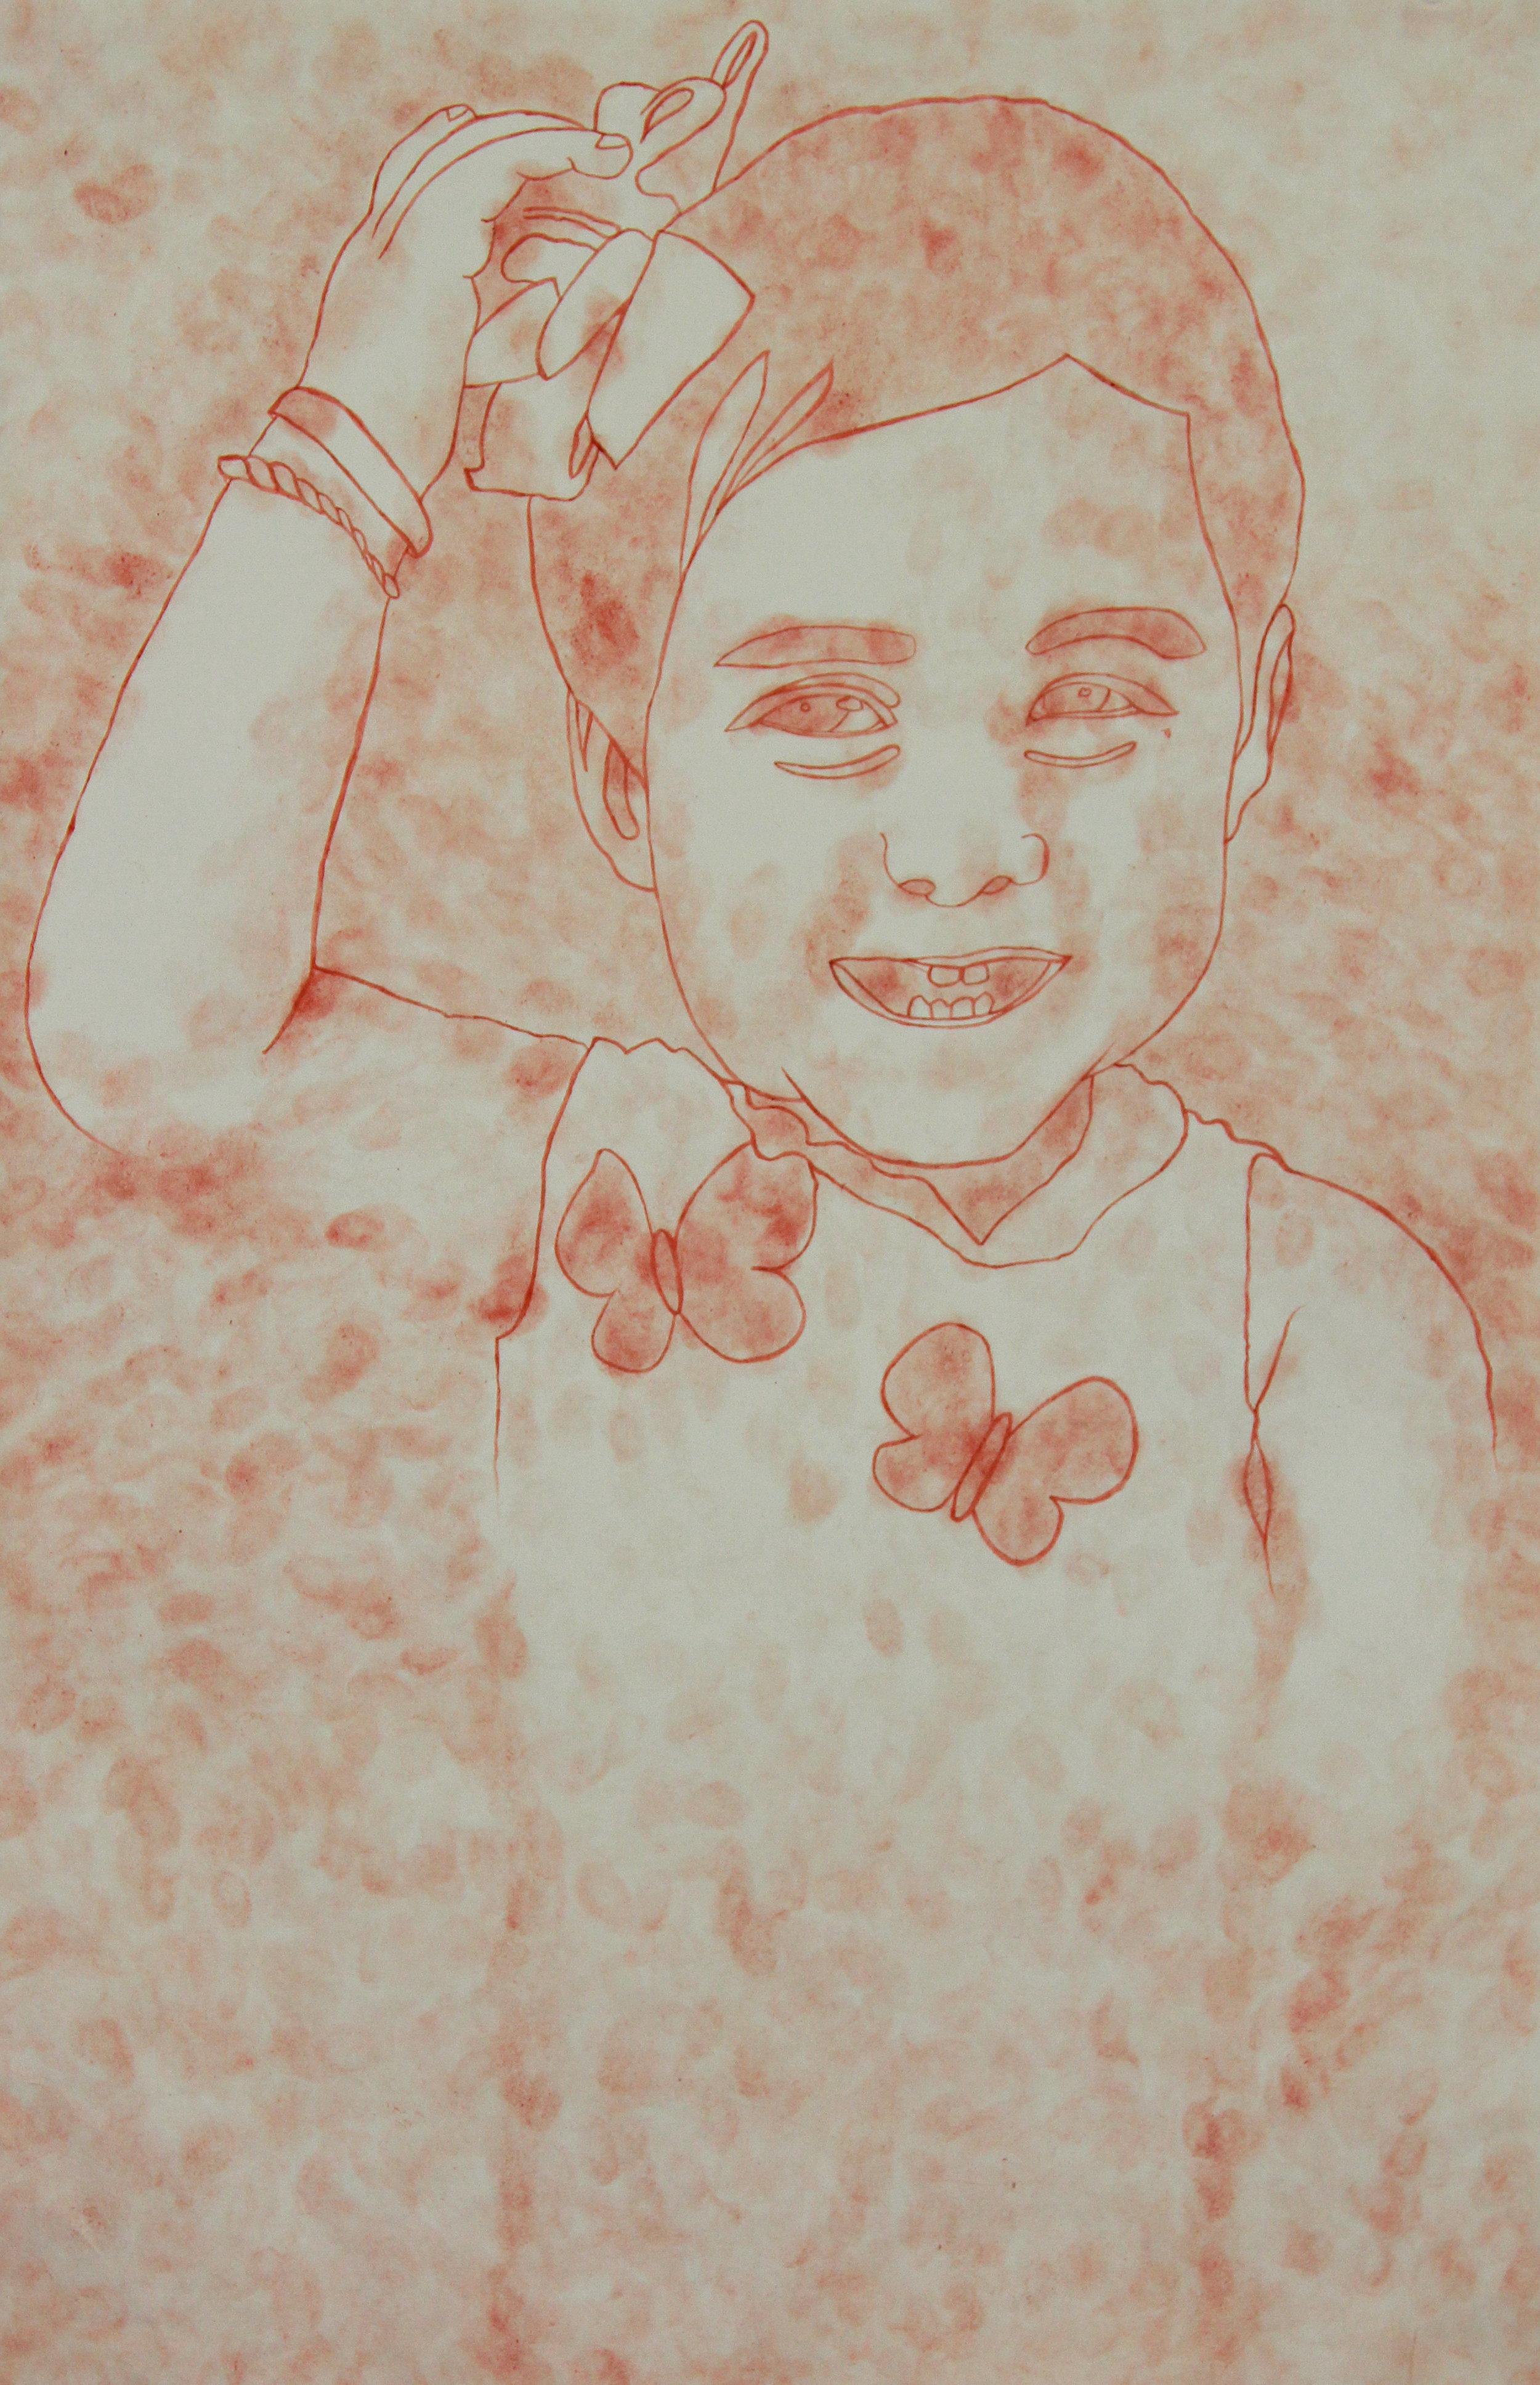 Chucherías de niñez   Flamin' Hot Cheetos dust and lime juice on paper